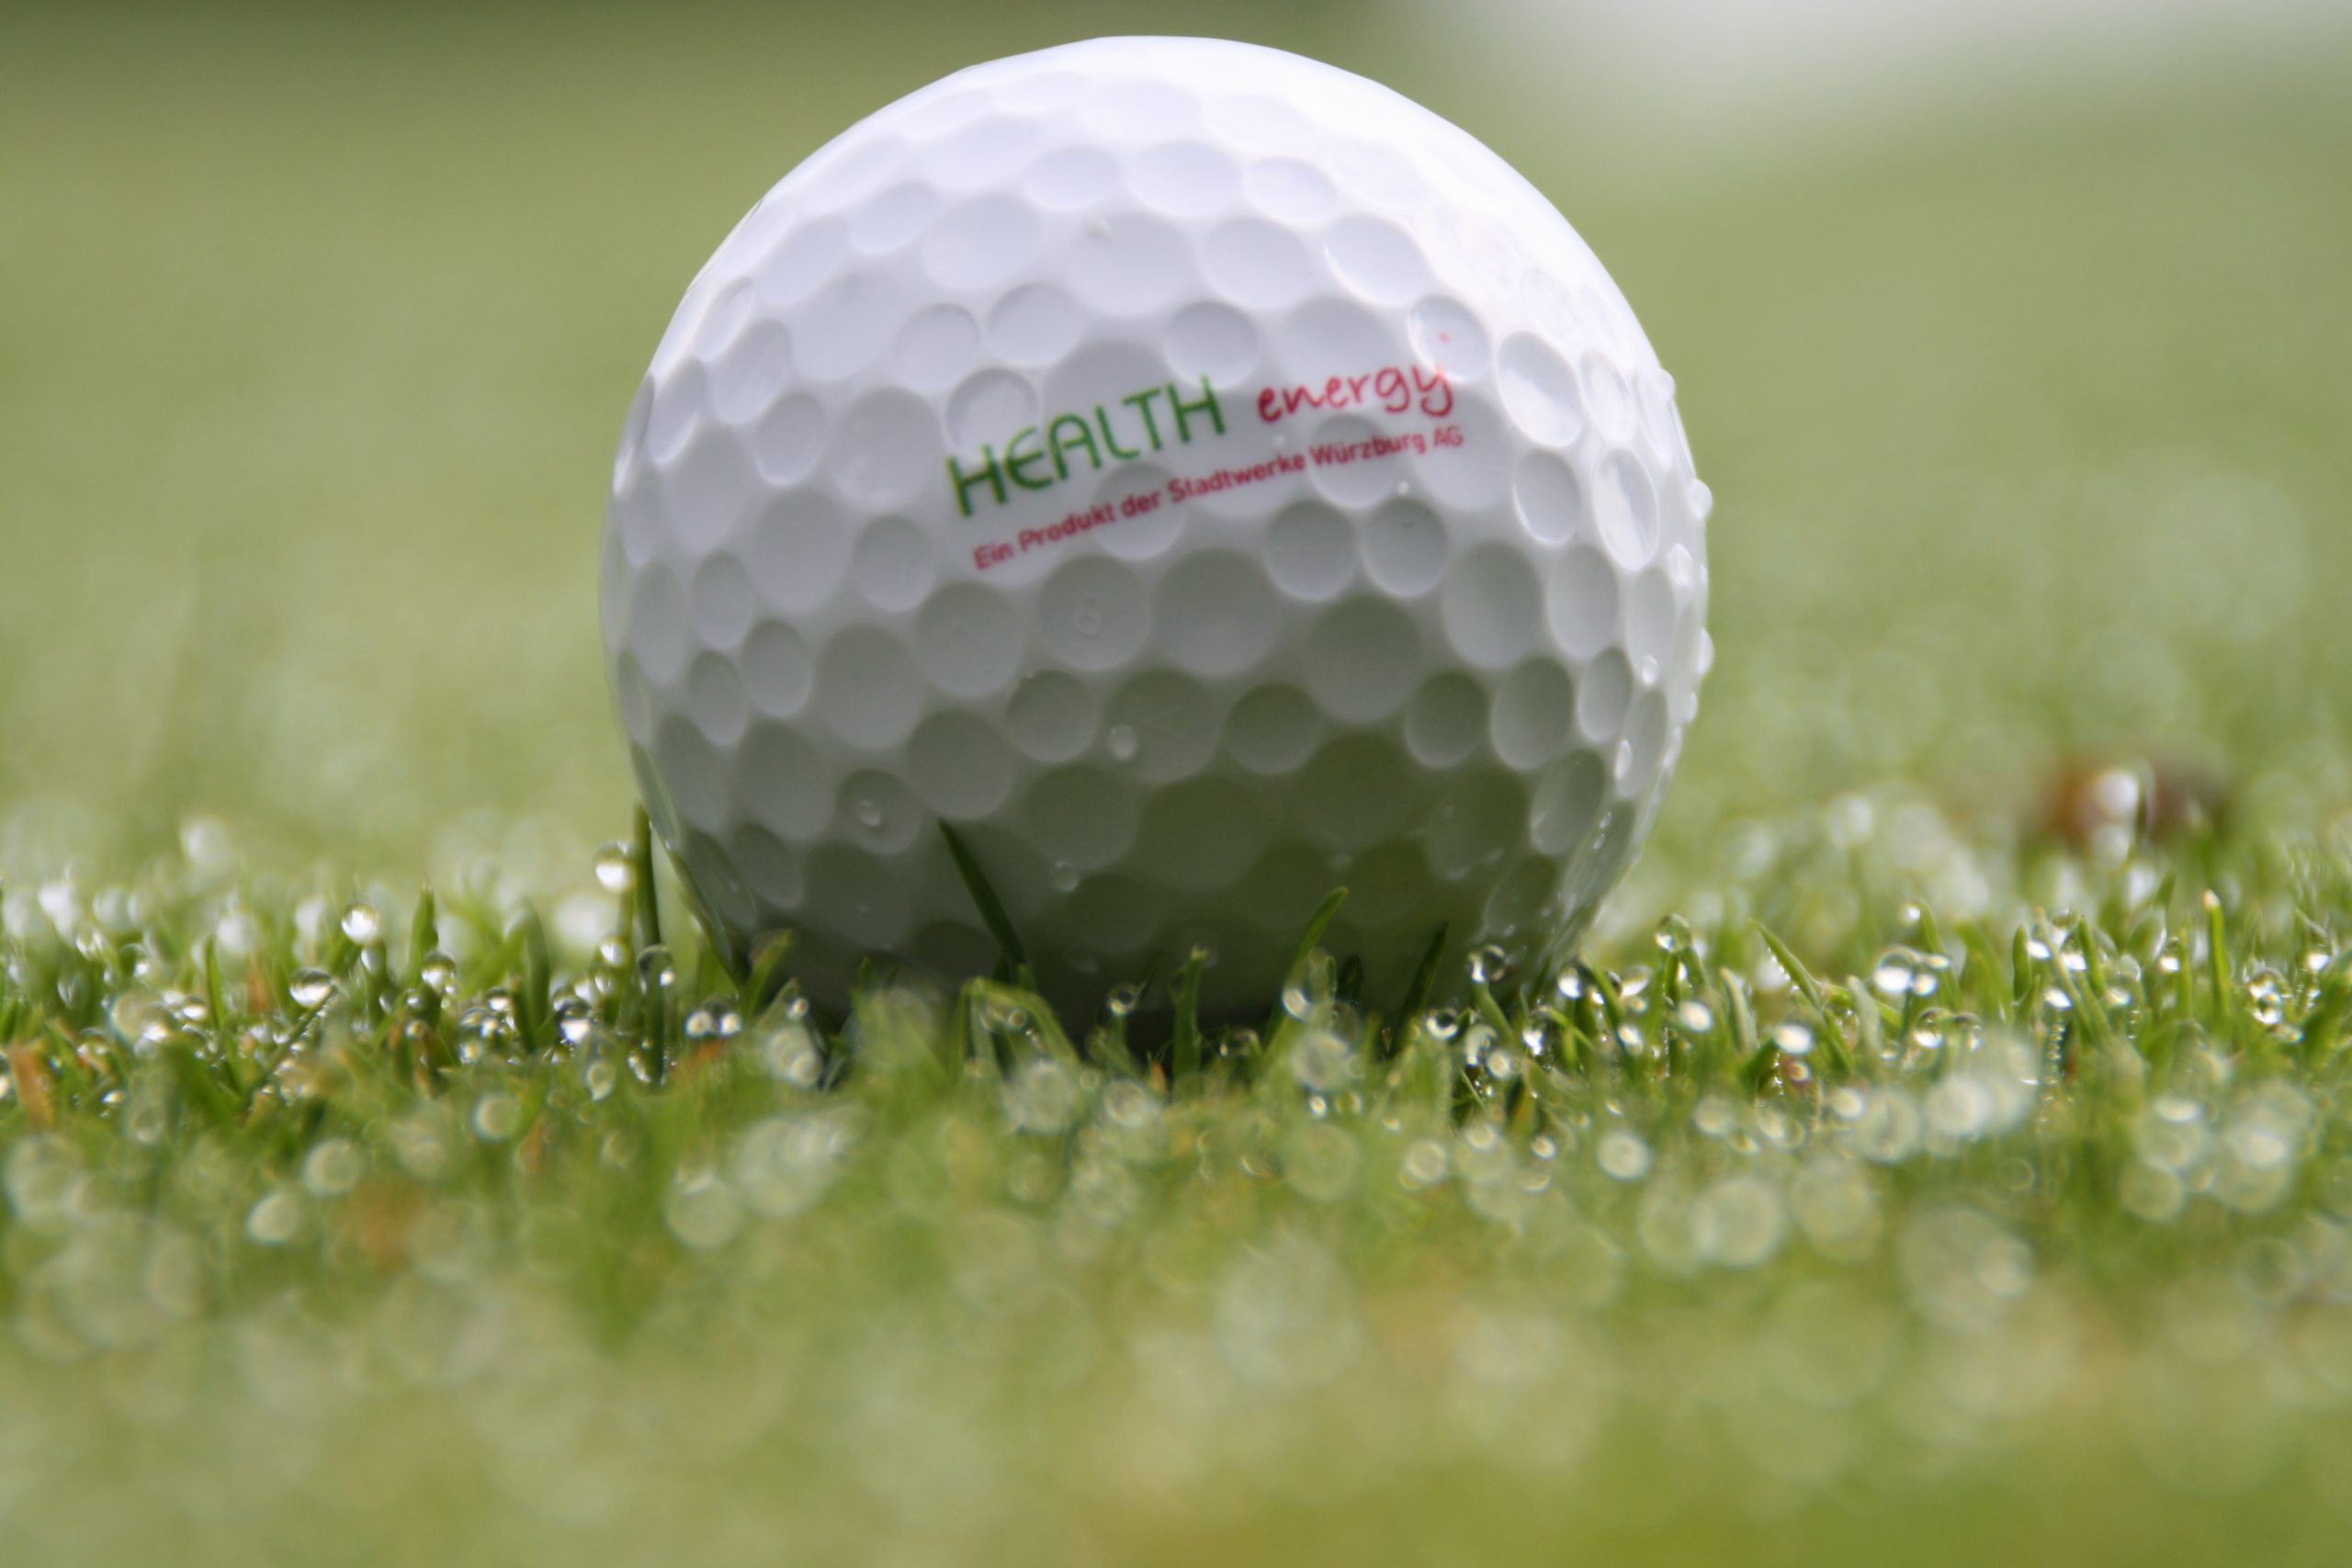 TV Mainfranken Golf & Gesundheit _ HEALTH energy®